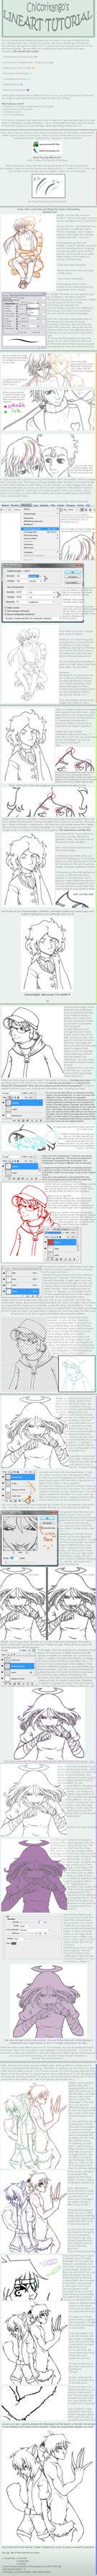 REUPLOAD - lineart tutorial by Kiwisaurus